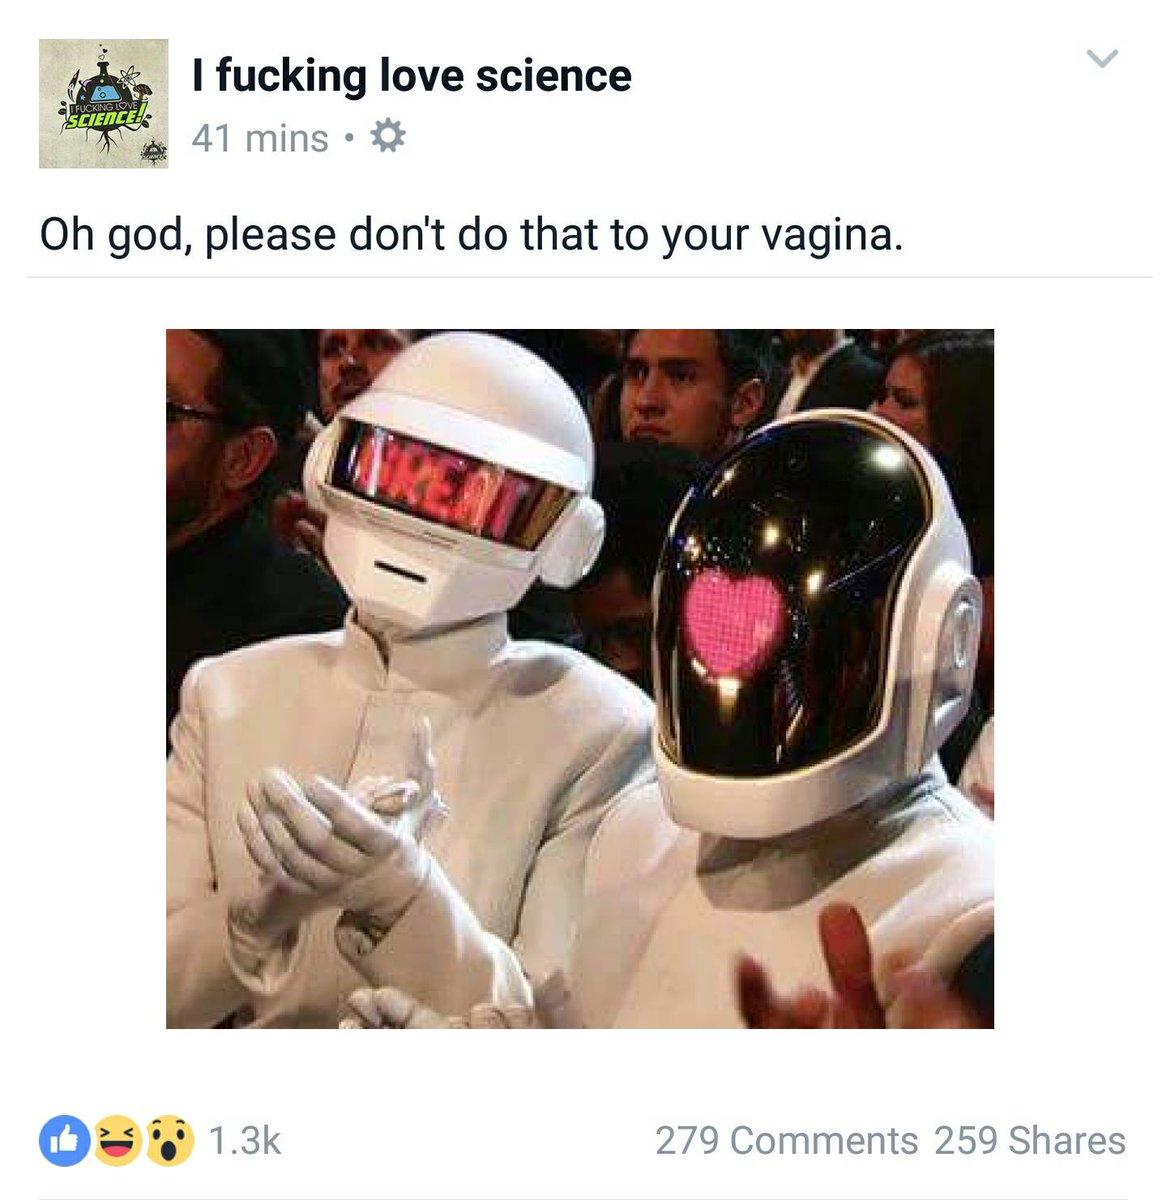 Do You Even Science, Bro